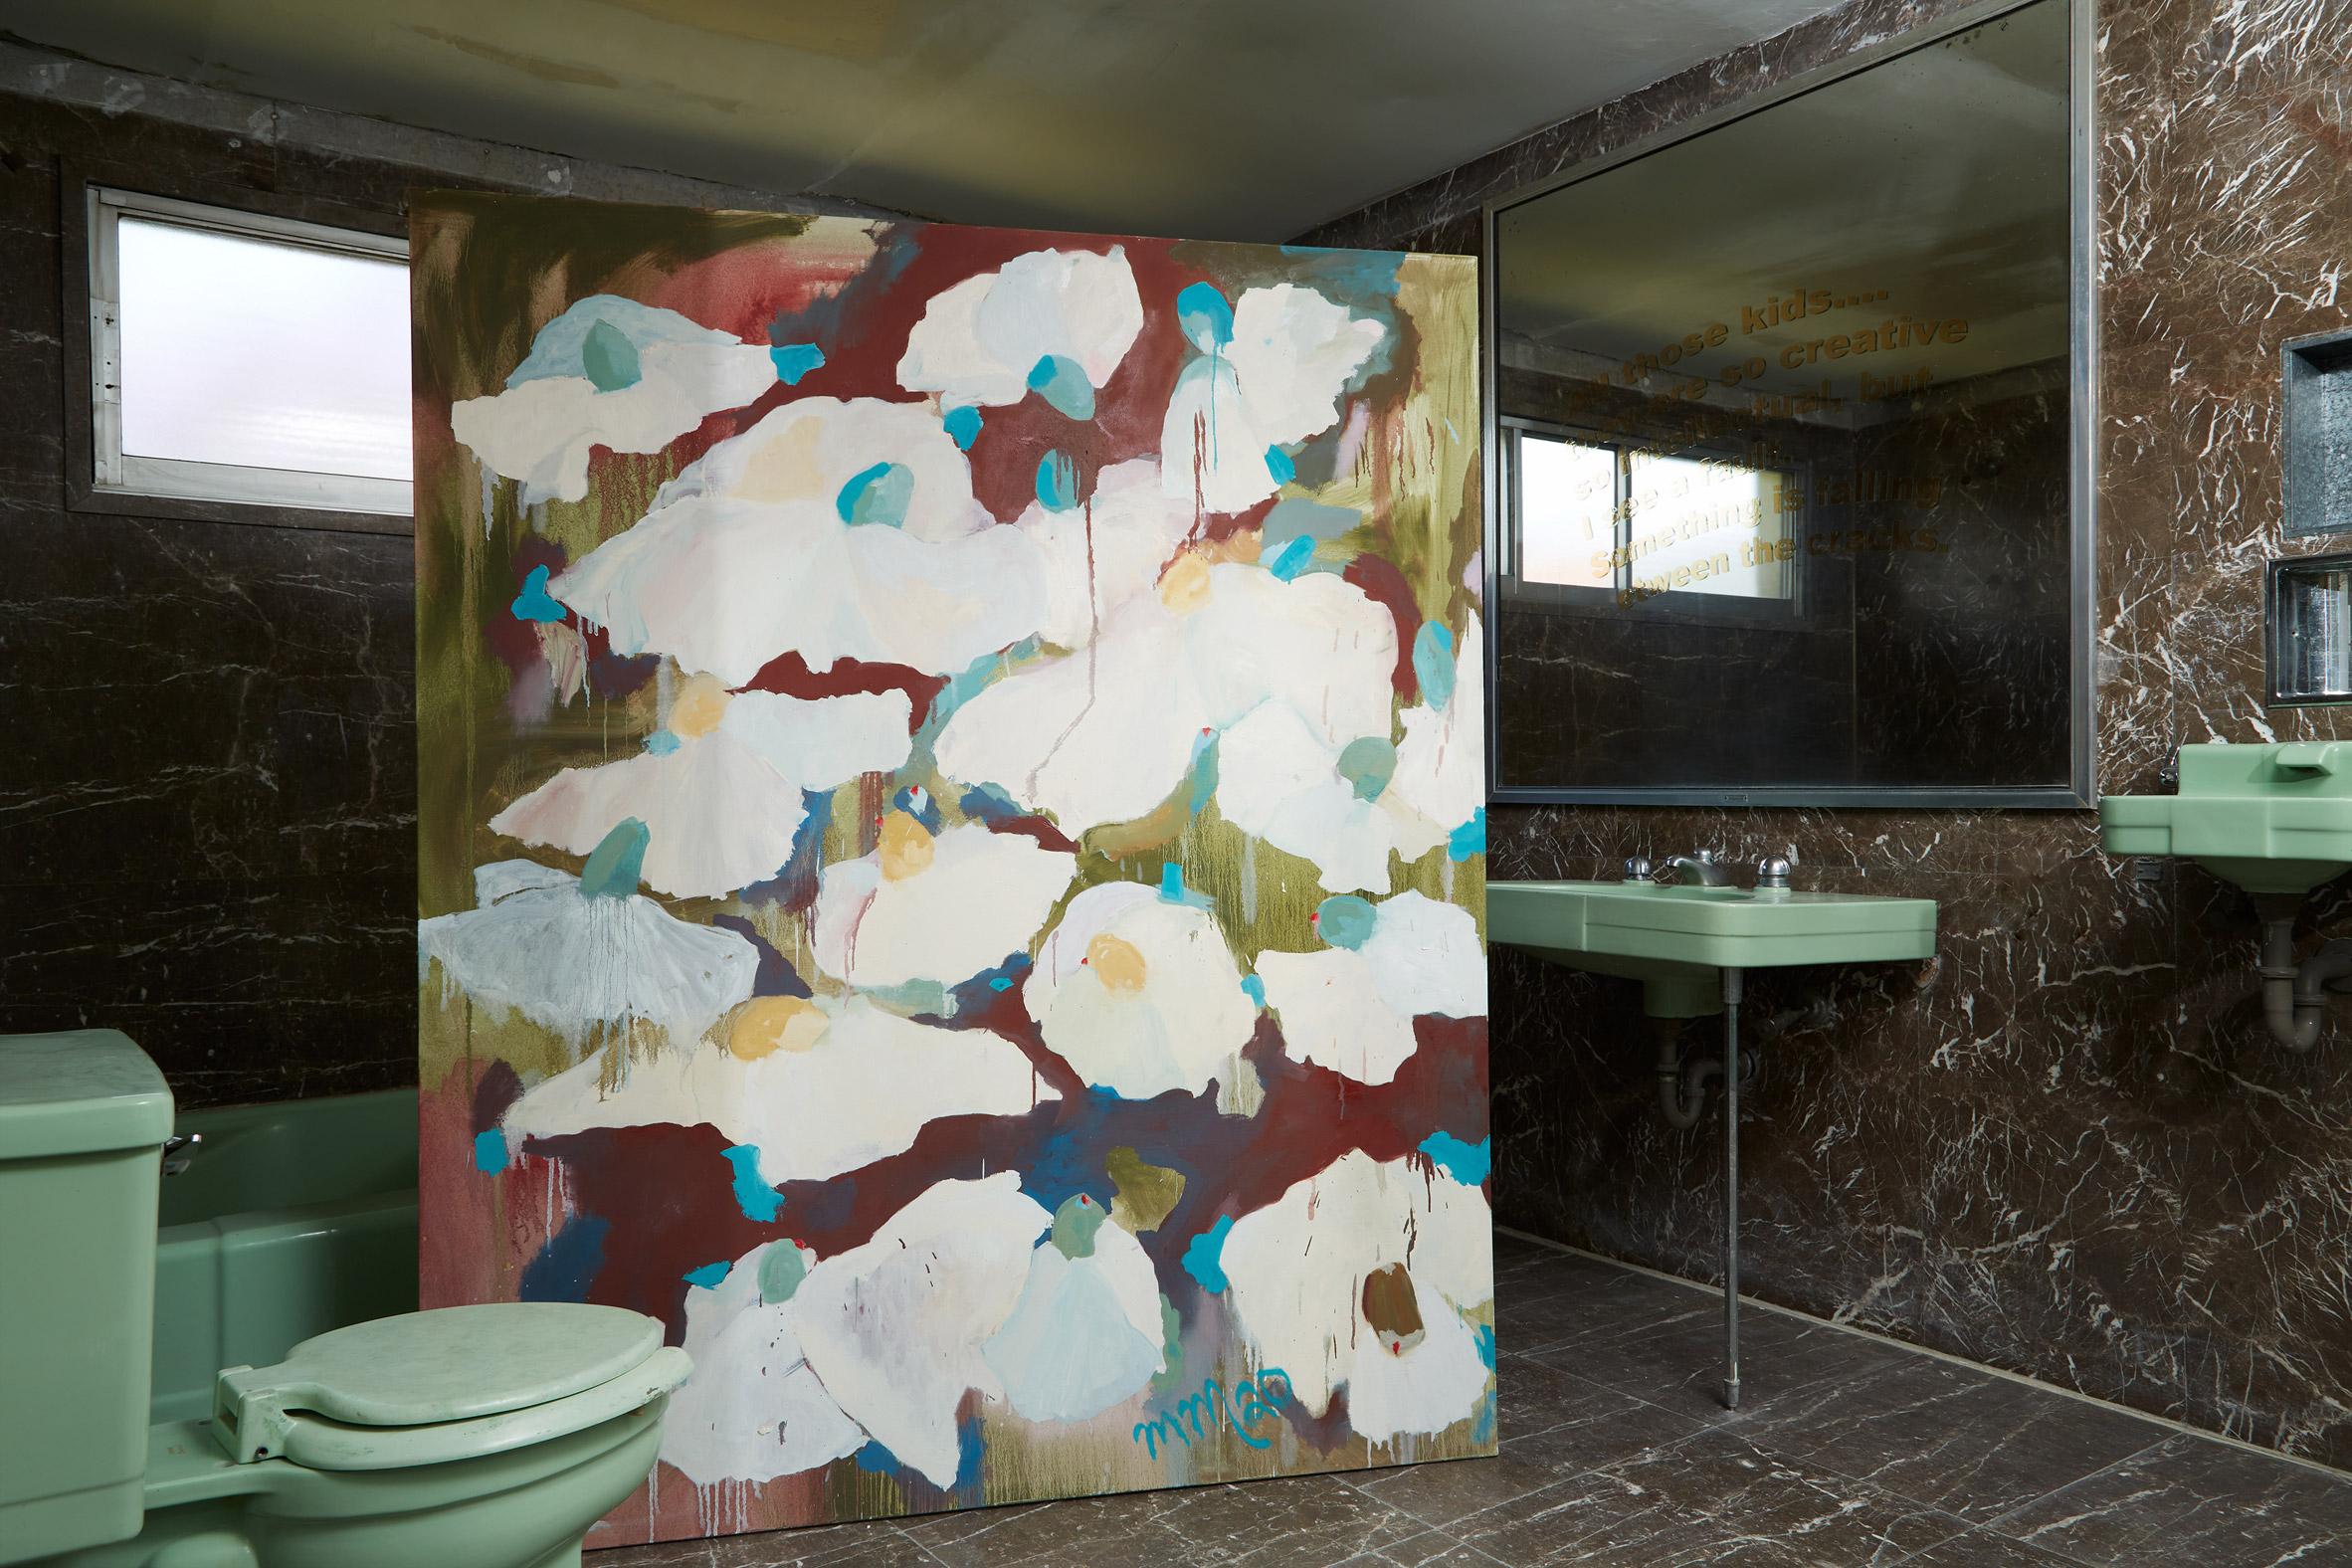 The bathroom of the house